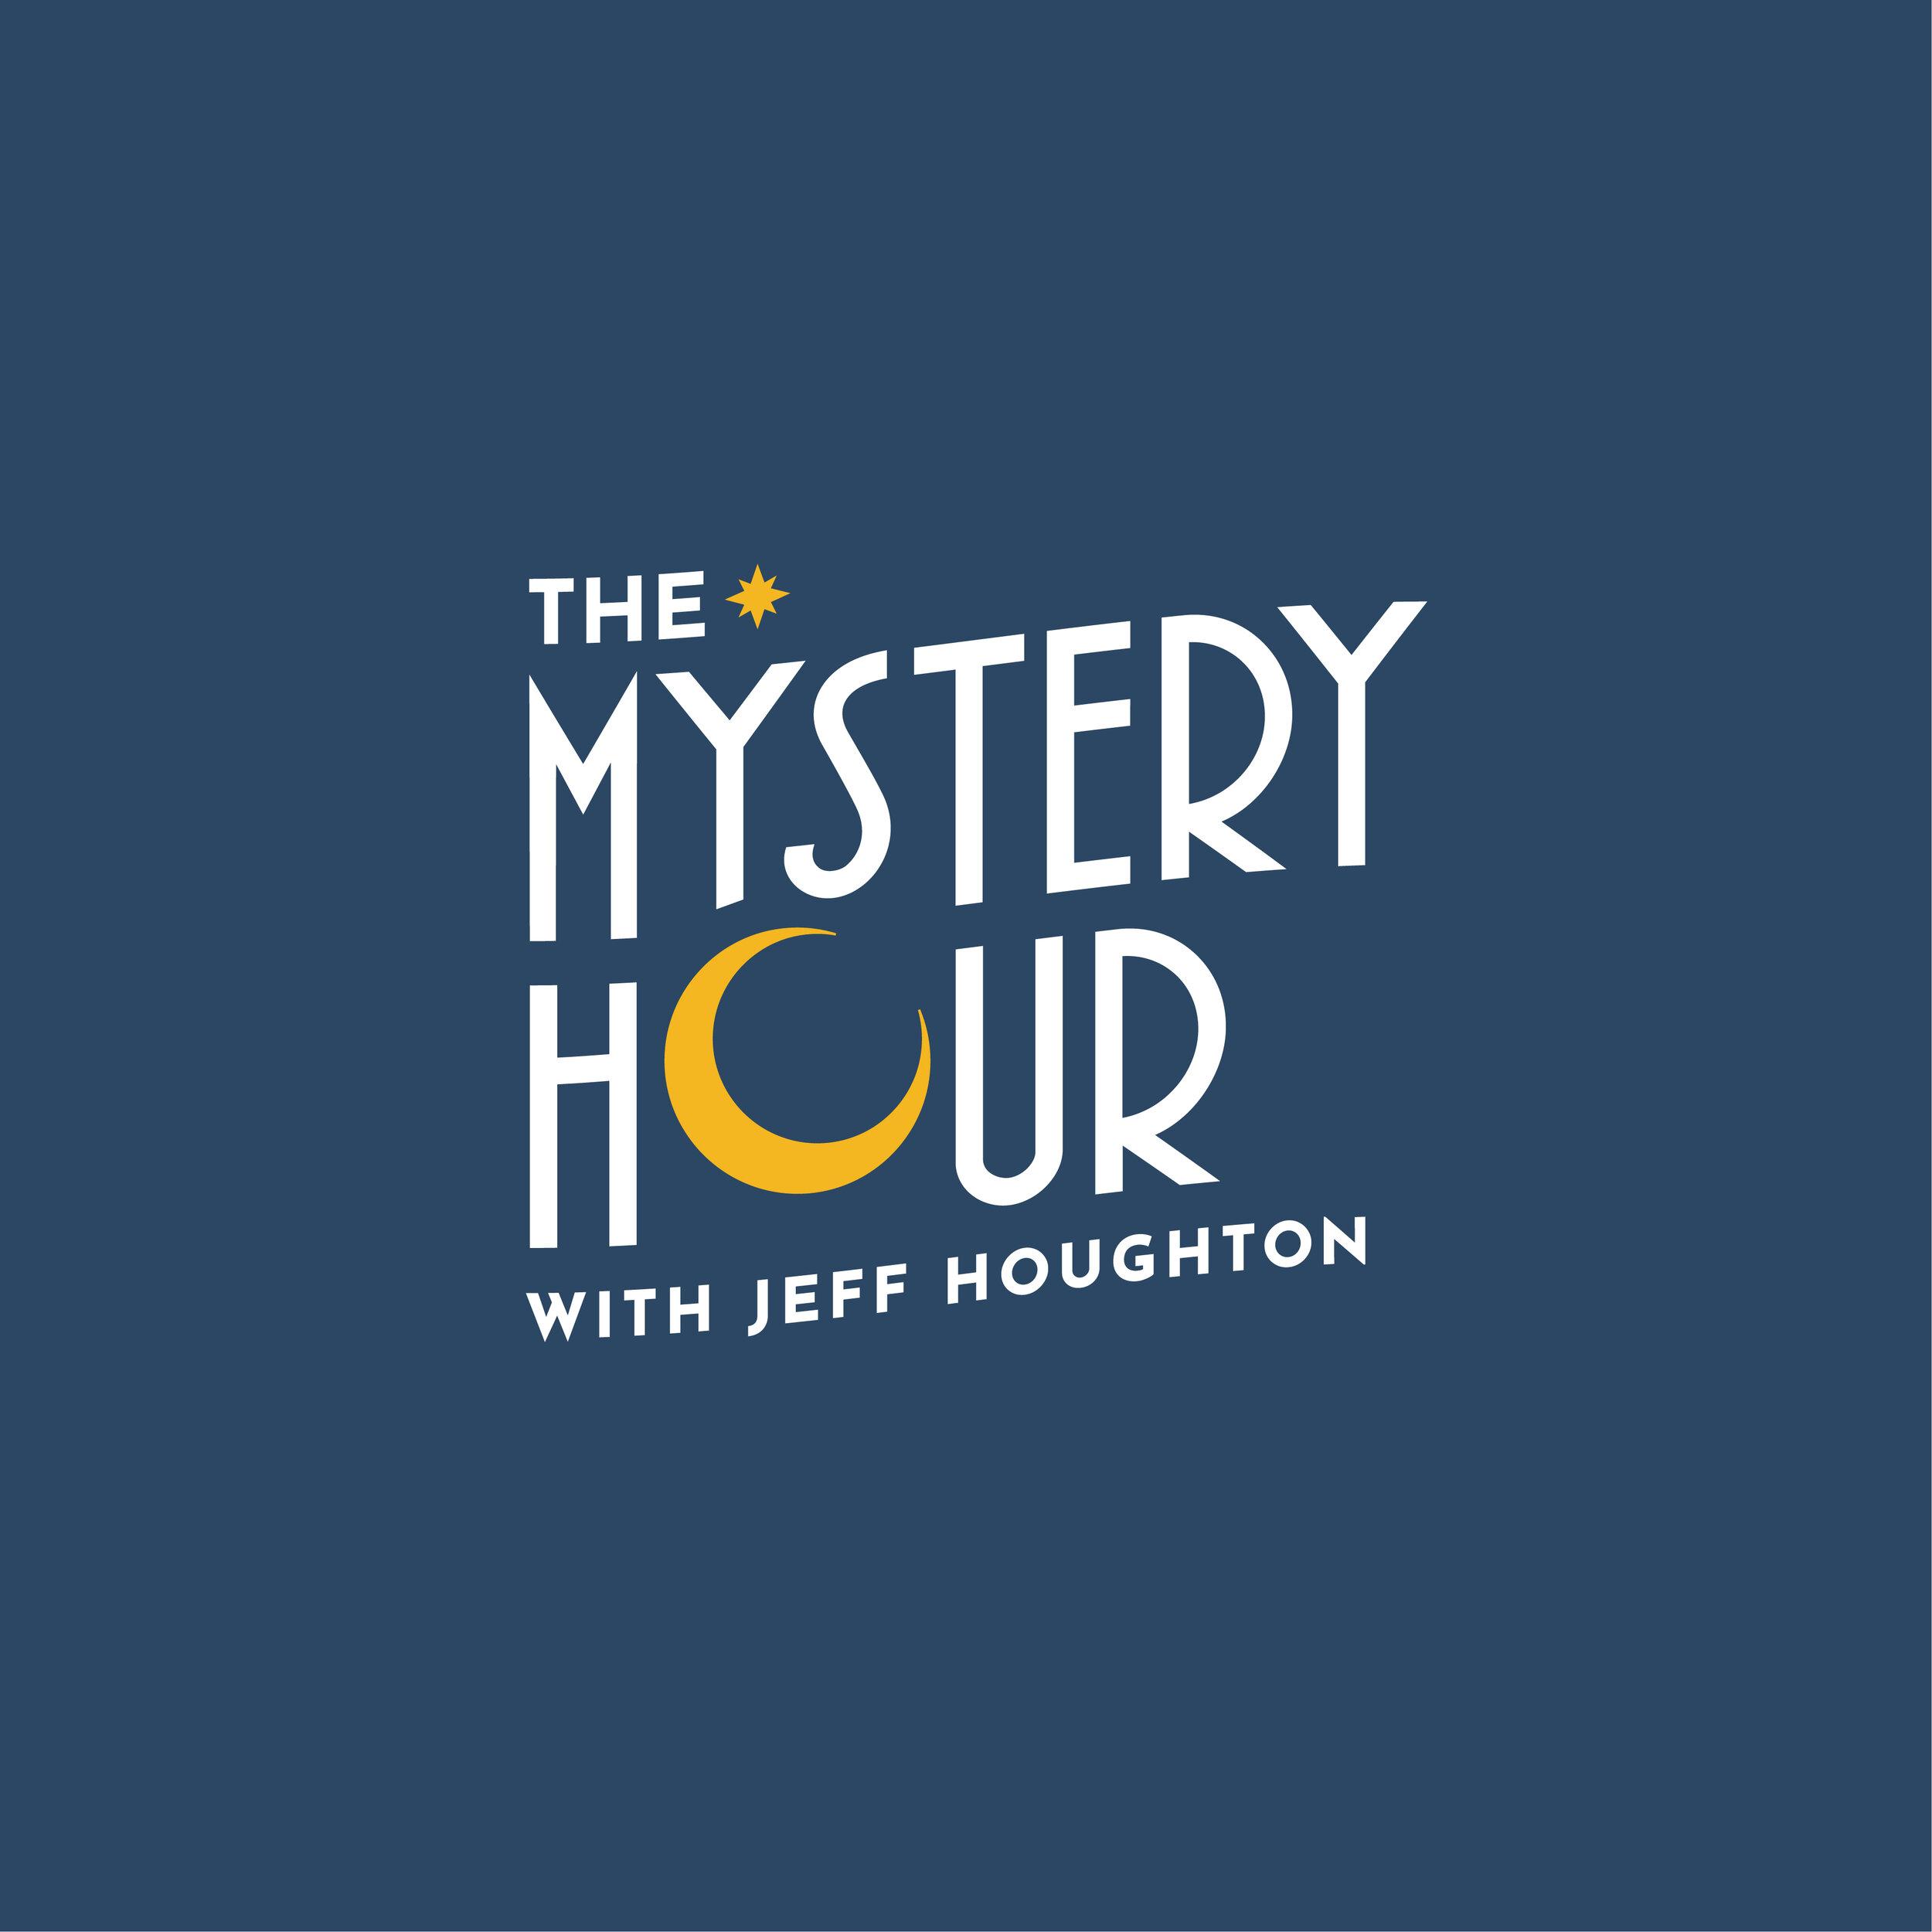 The-Mystery-Hour-logo-blue-bkgnd_stacked.jpg